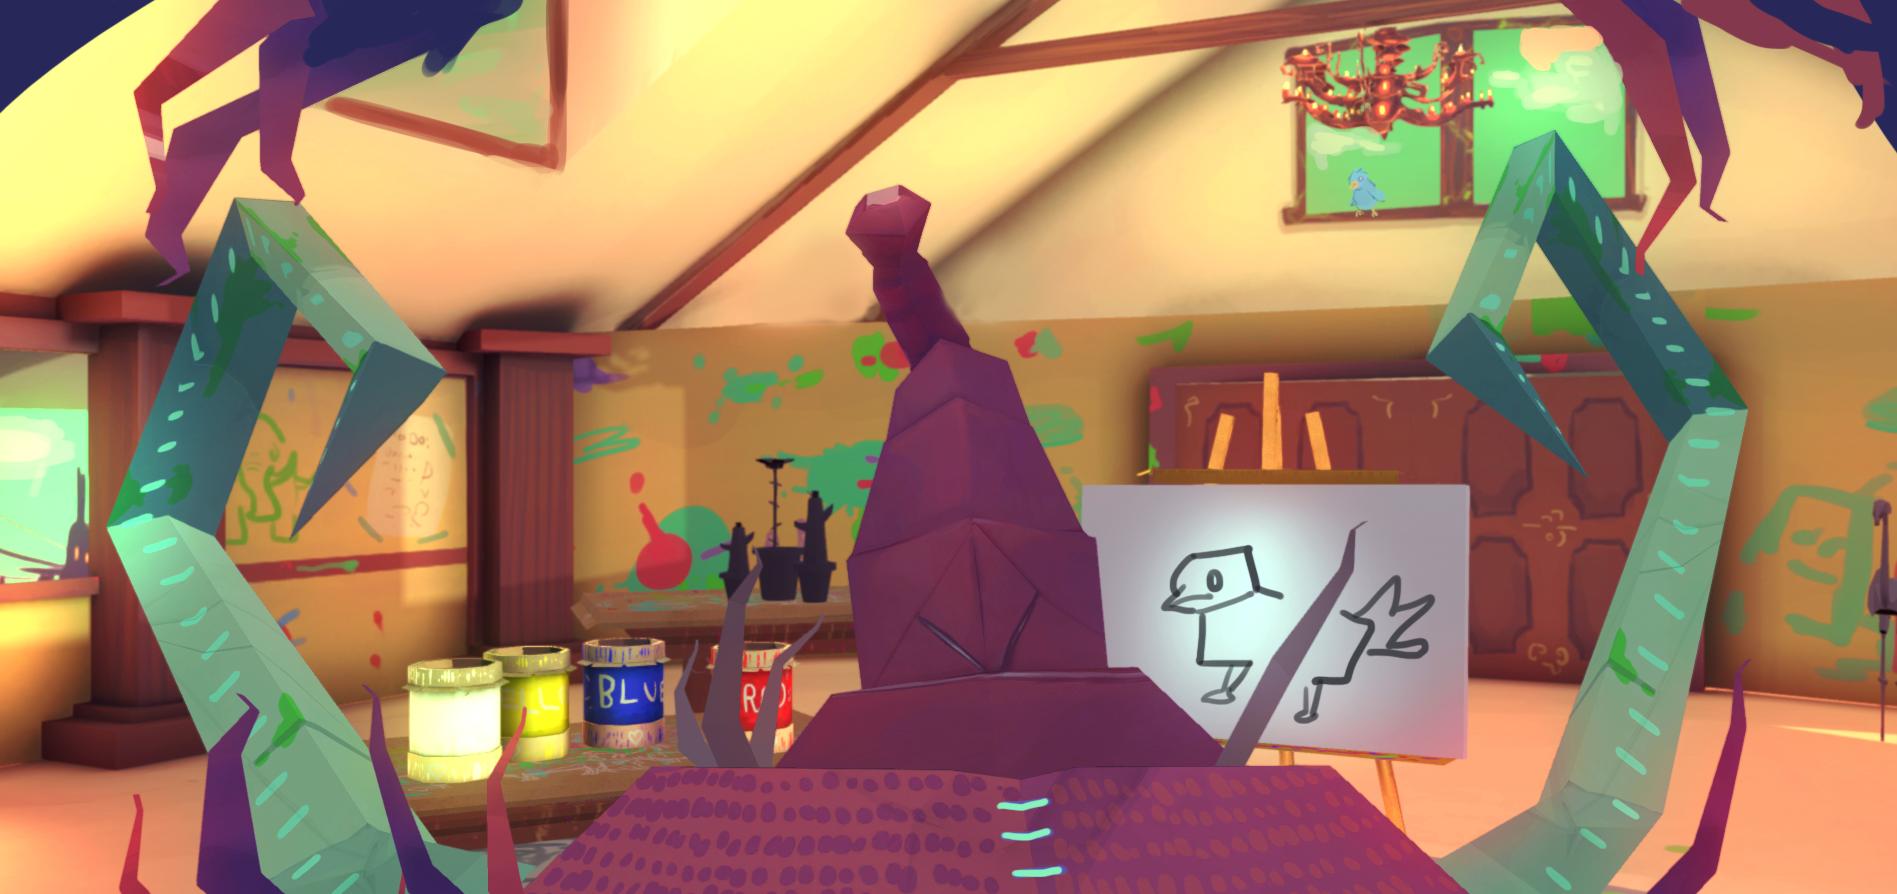 masterpiece-mammoth-max-piantoni-screenshot